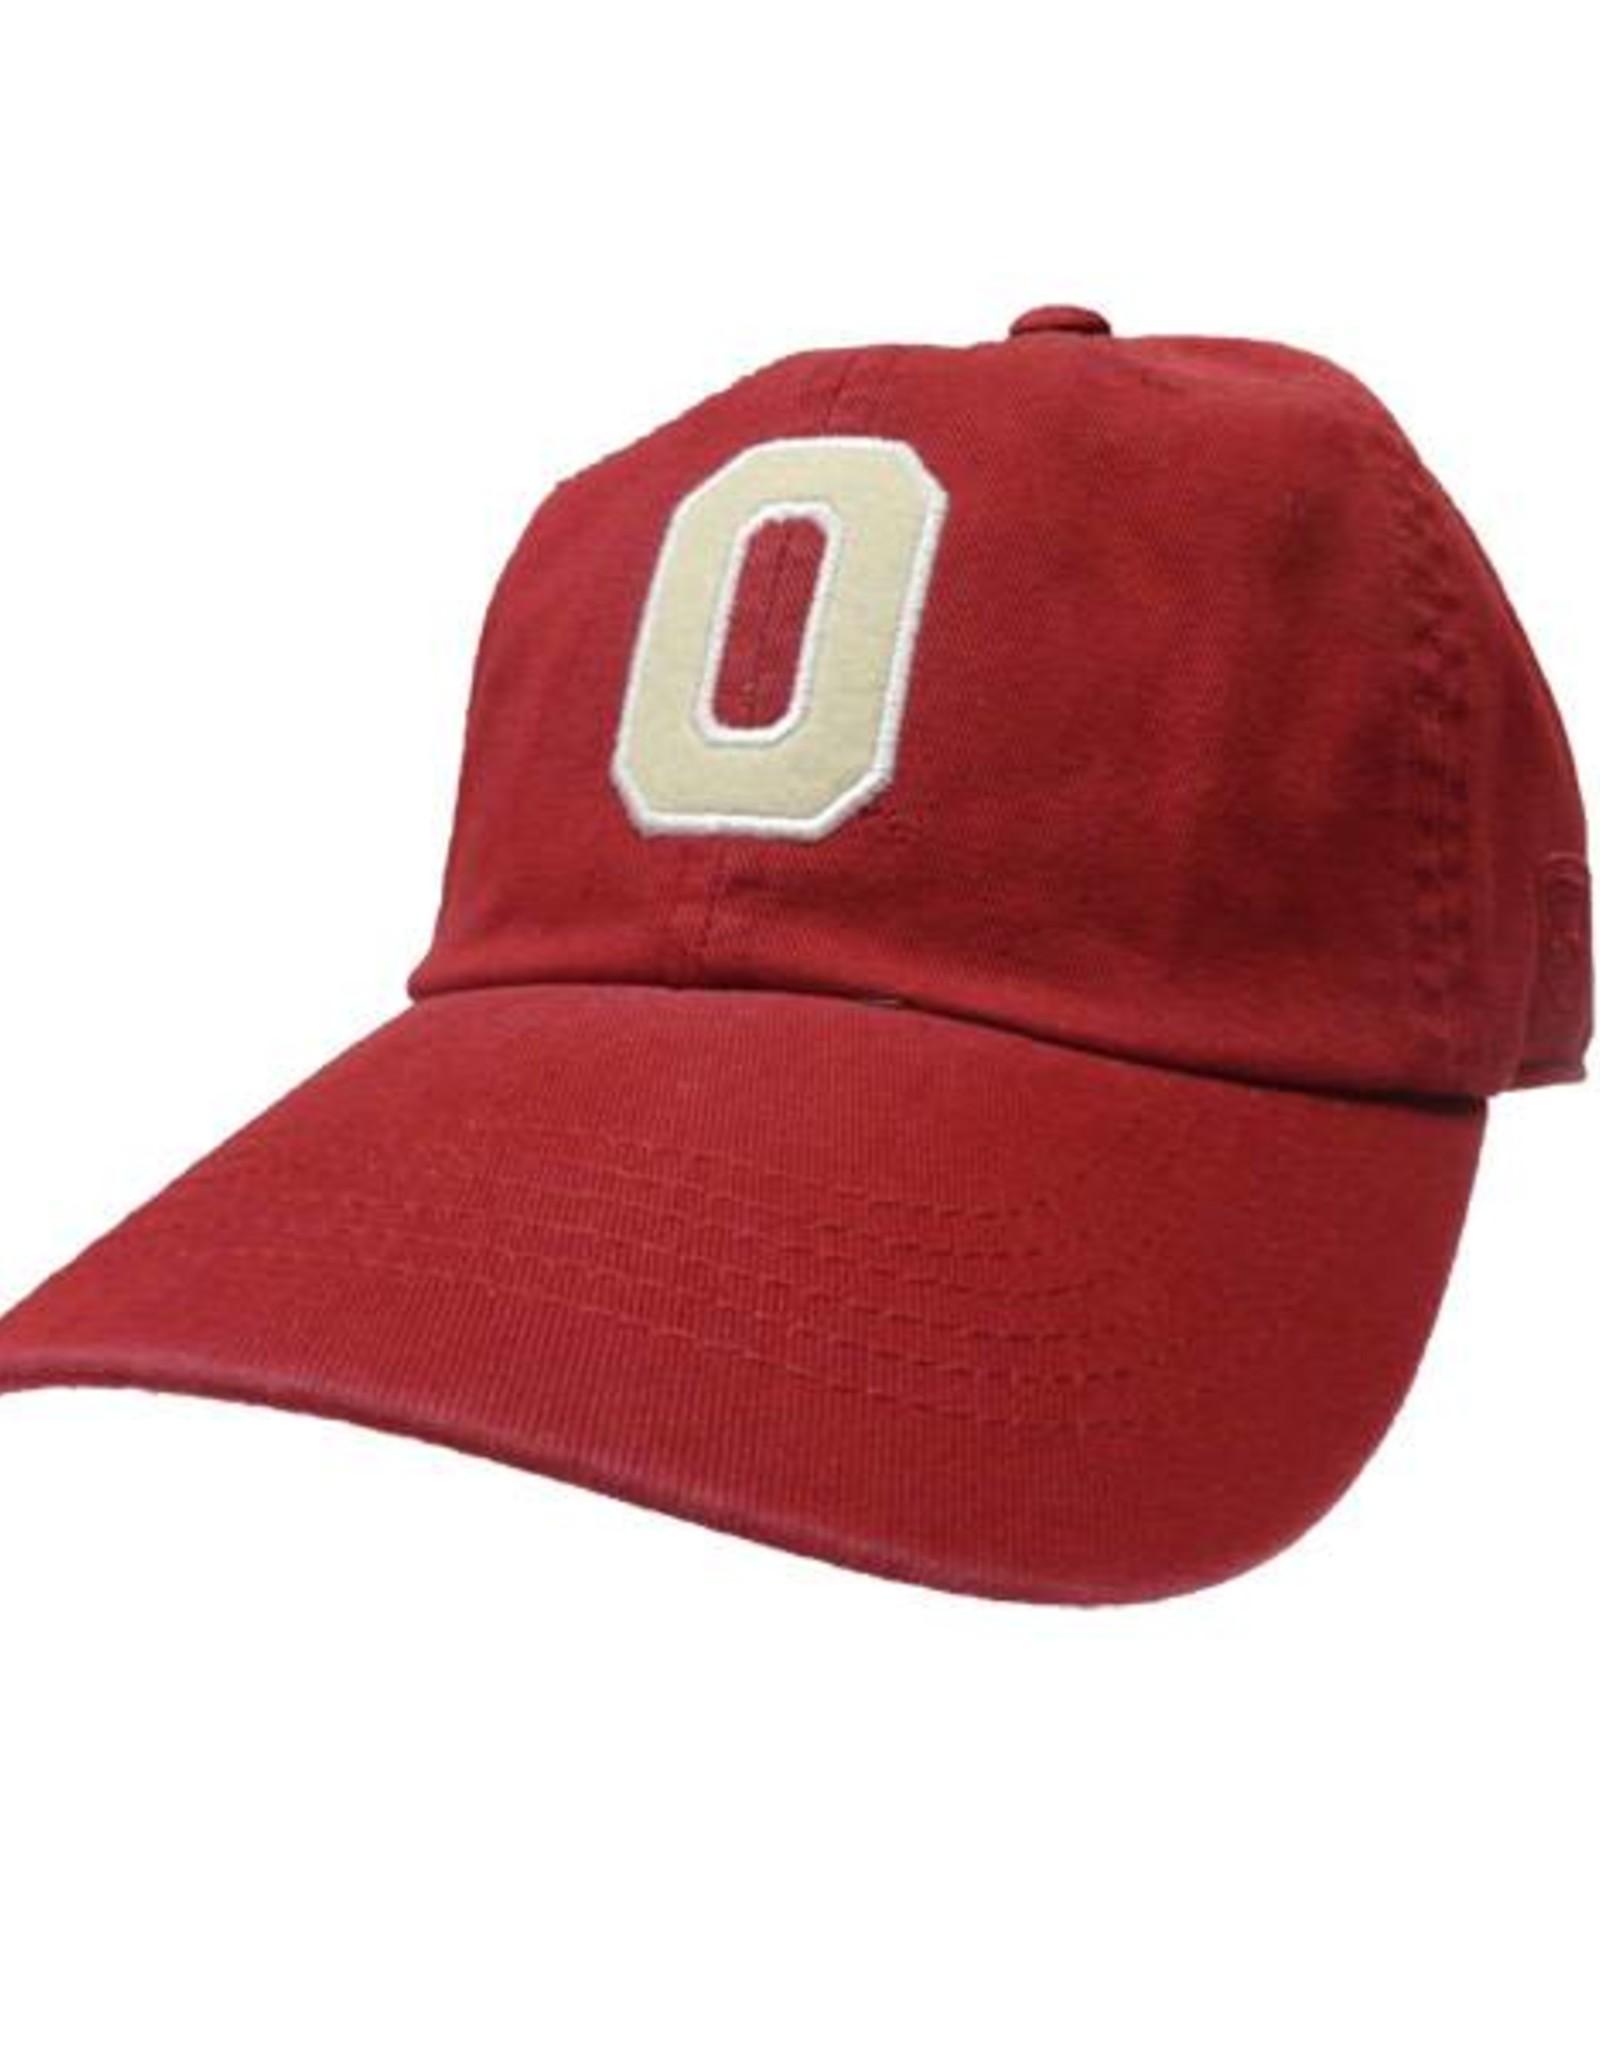 Top of the World TOW Crimson Felt Block Vintage O Hat